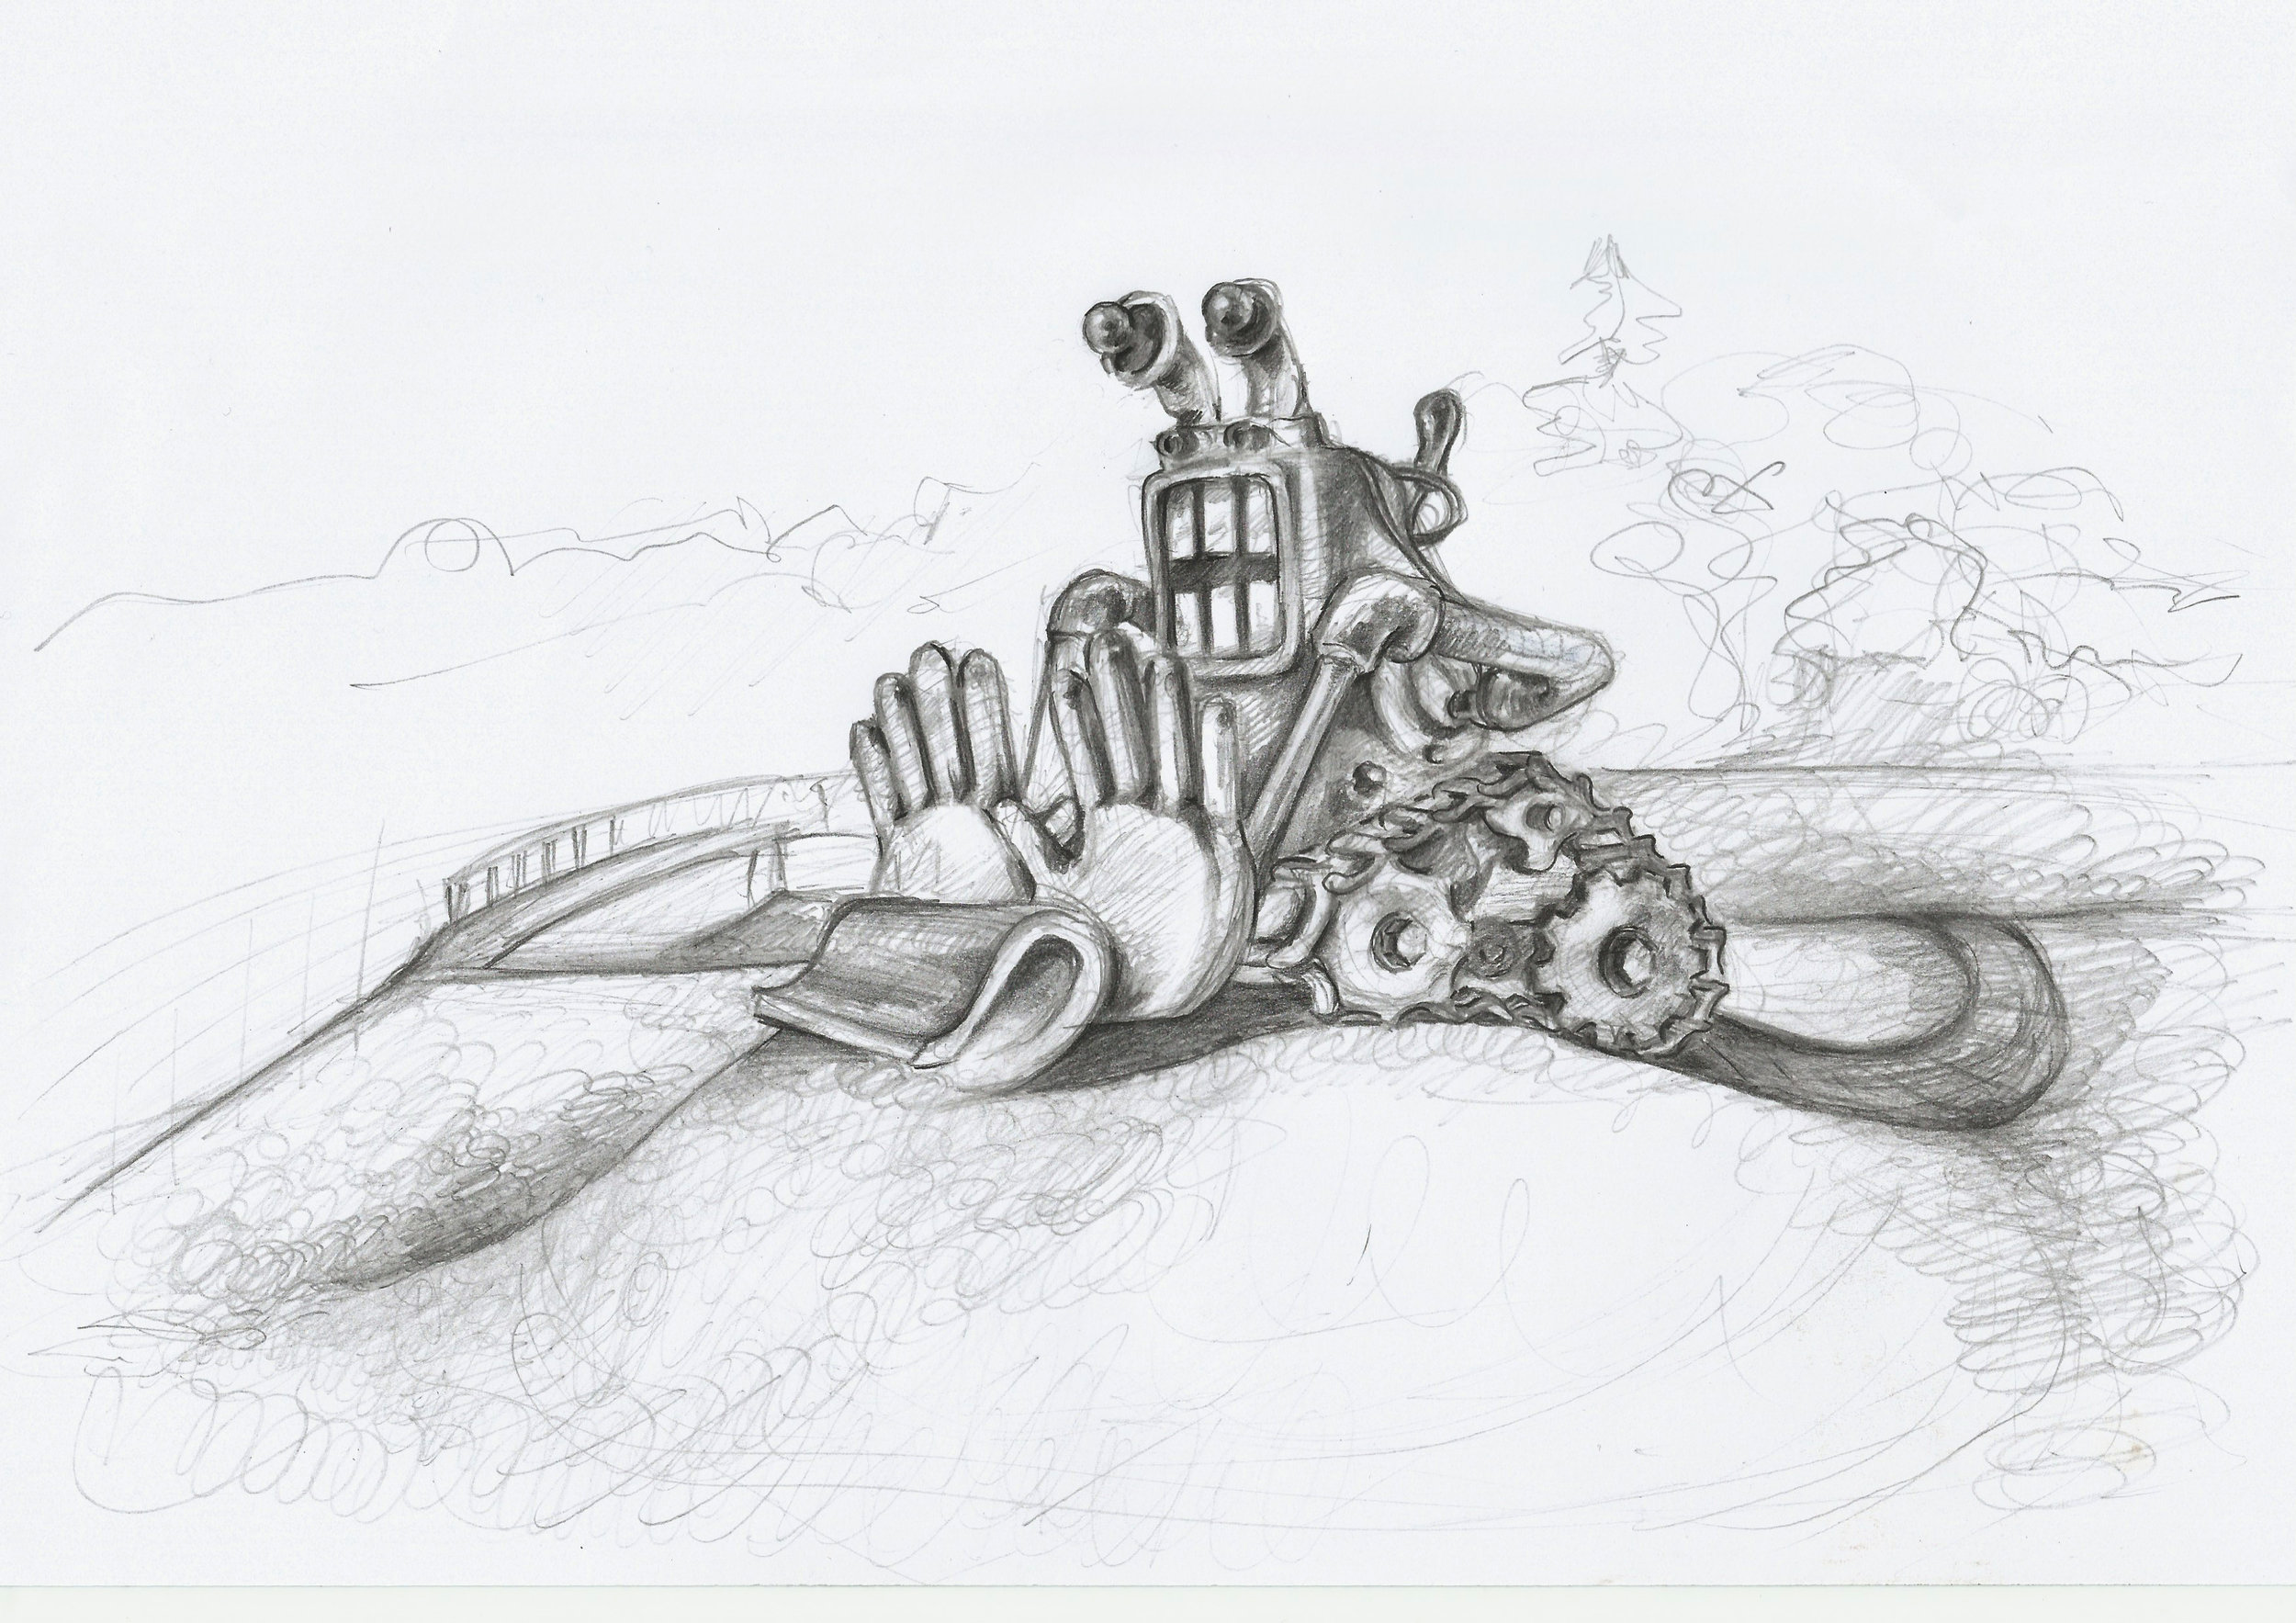 Sculpture Concept for Australian Sculptor Sam Deal  Graphite pencil